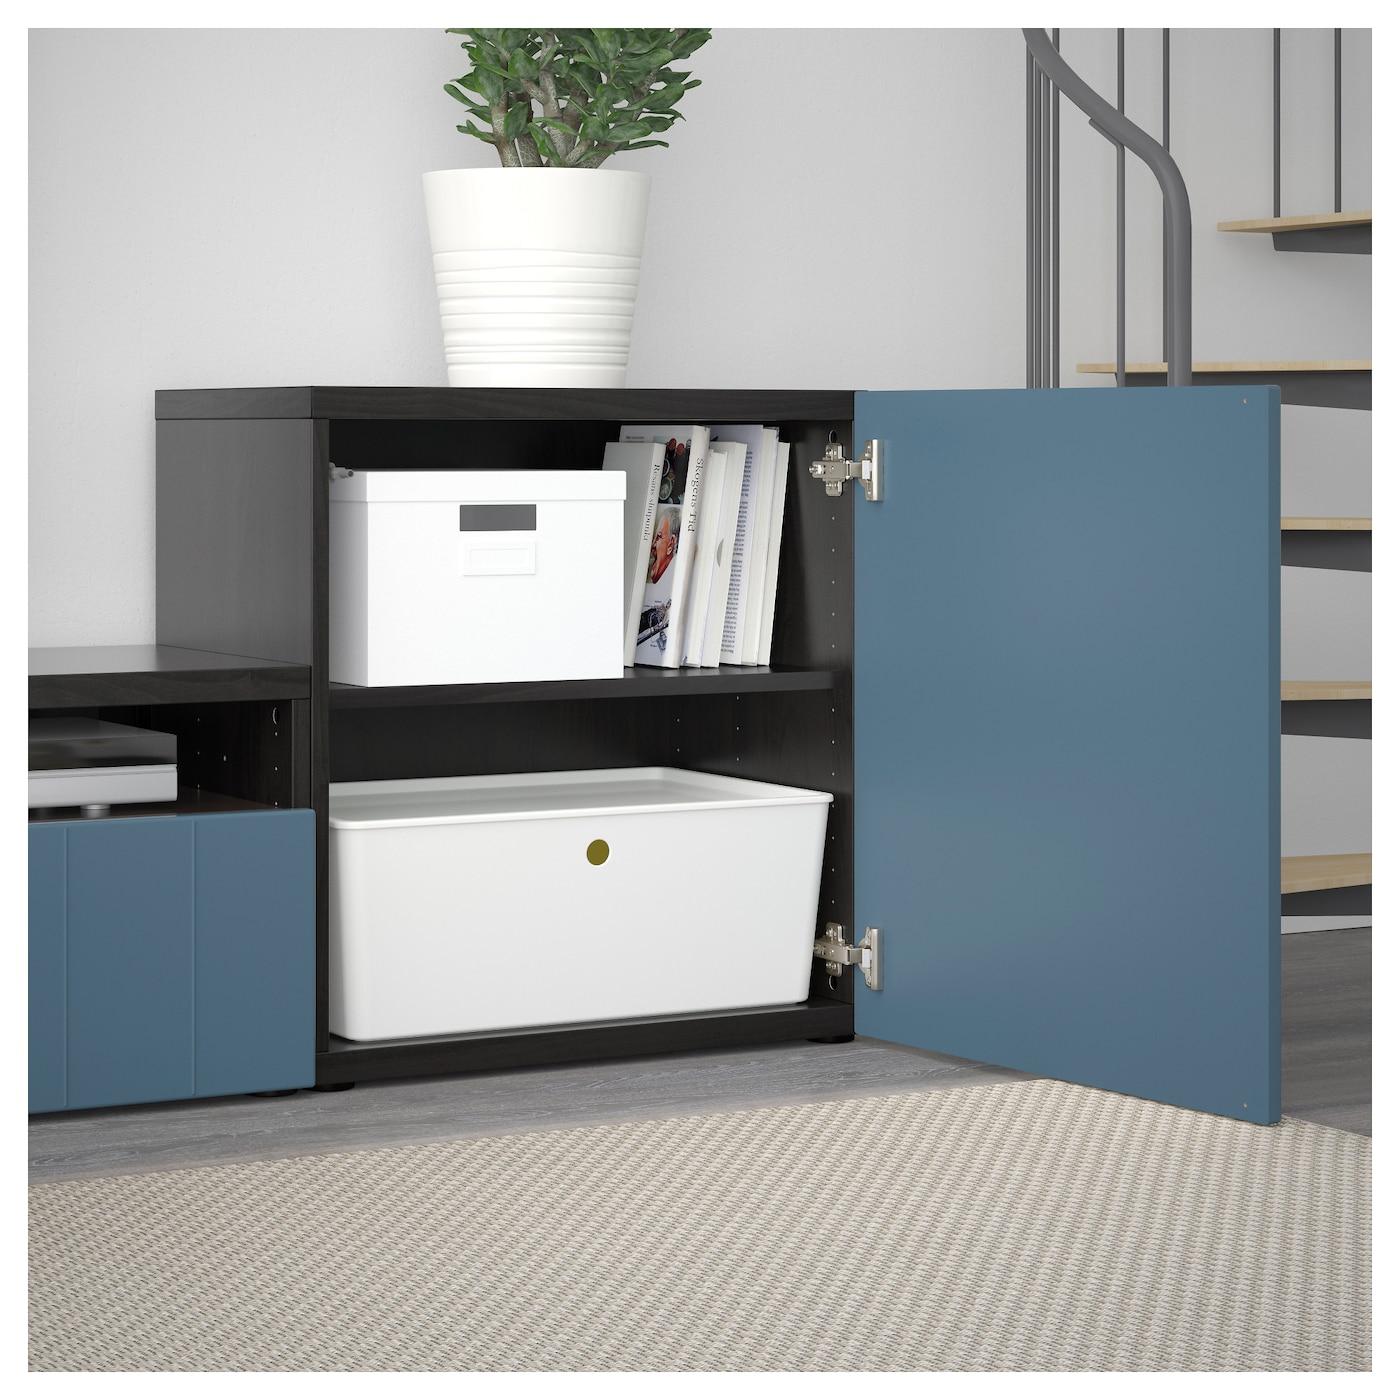 Best mueble tv con almacenaje negro marr n hallstavik azul oscuro vidrio incoloro 300 x 20 40 x - Muebles almacenaje ikea ...